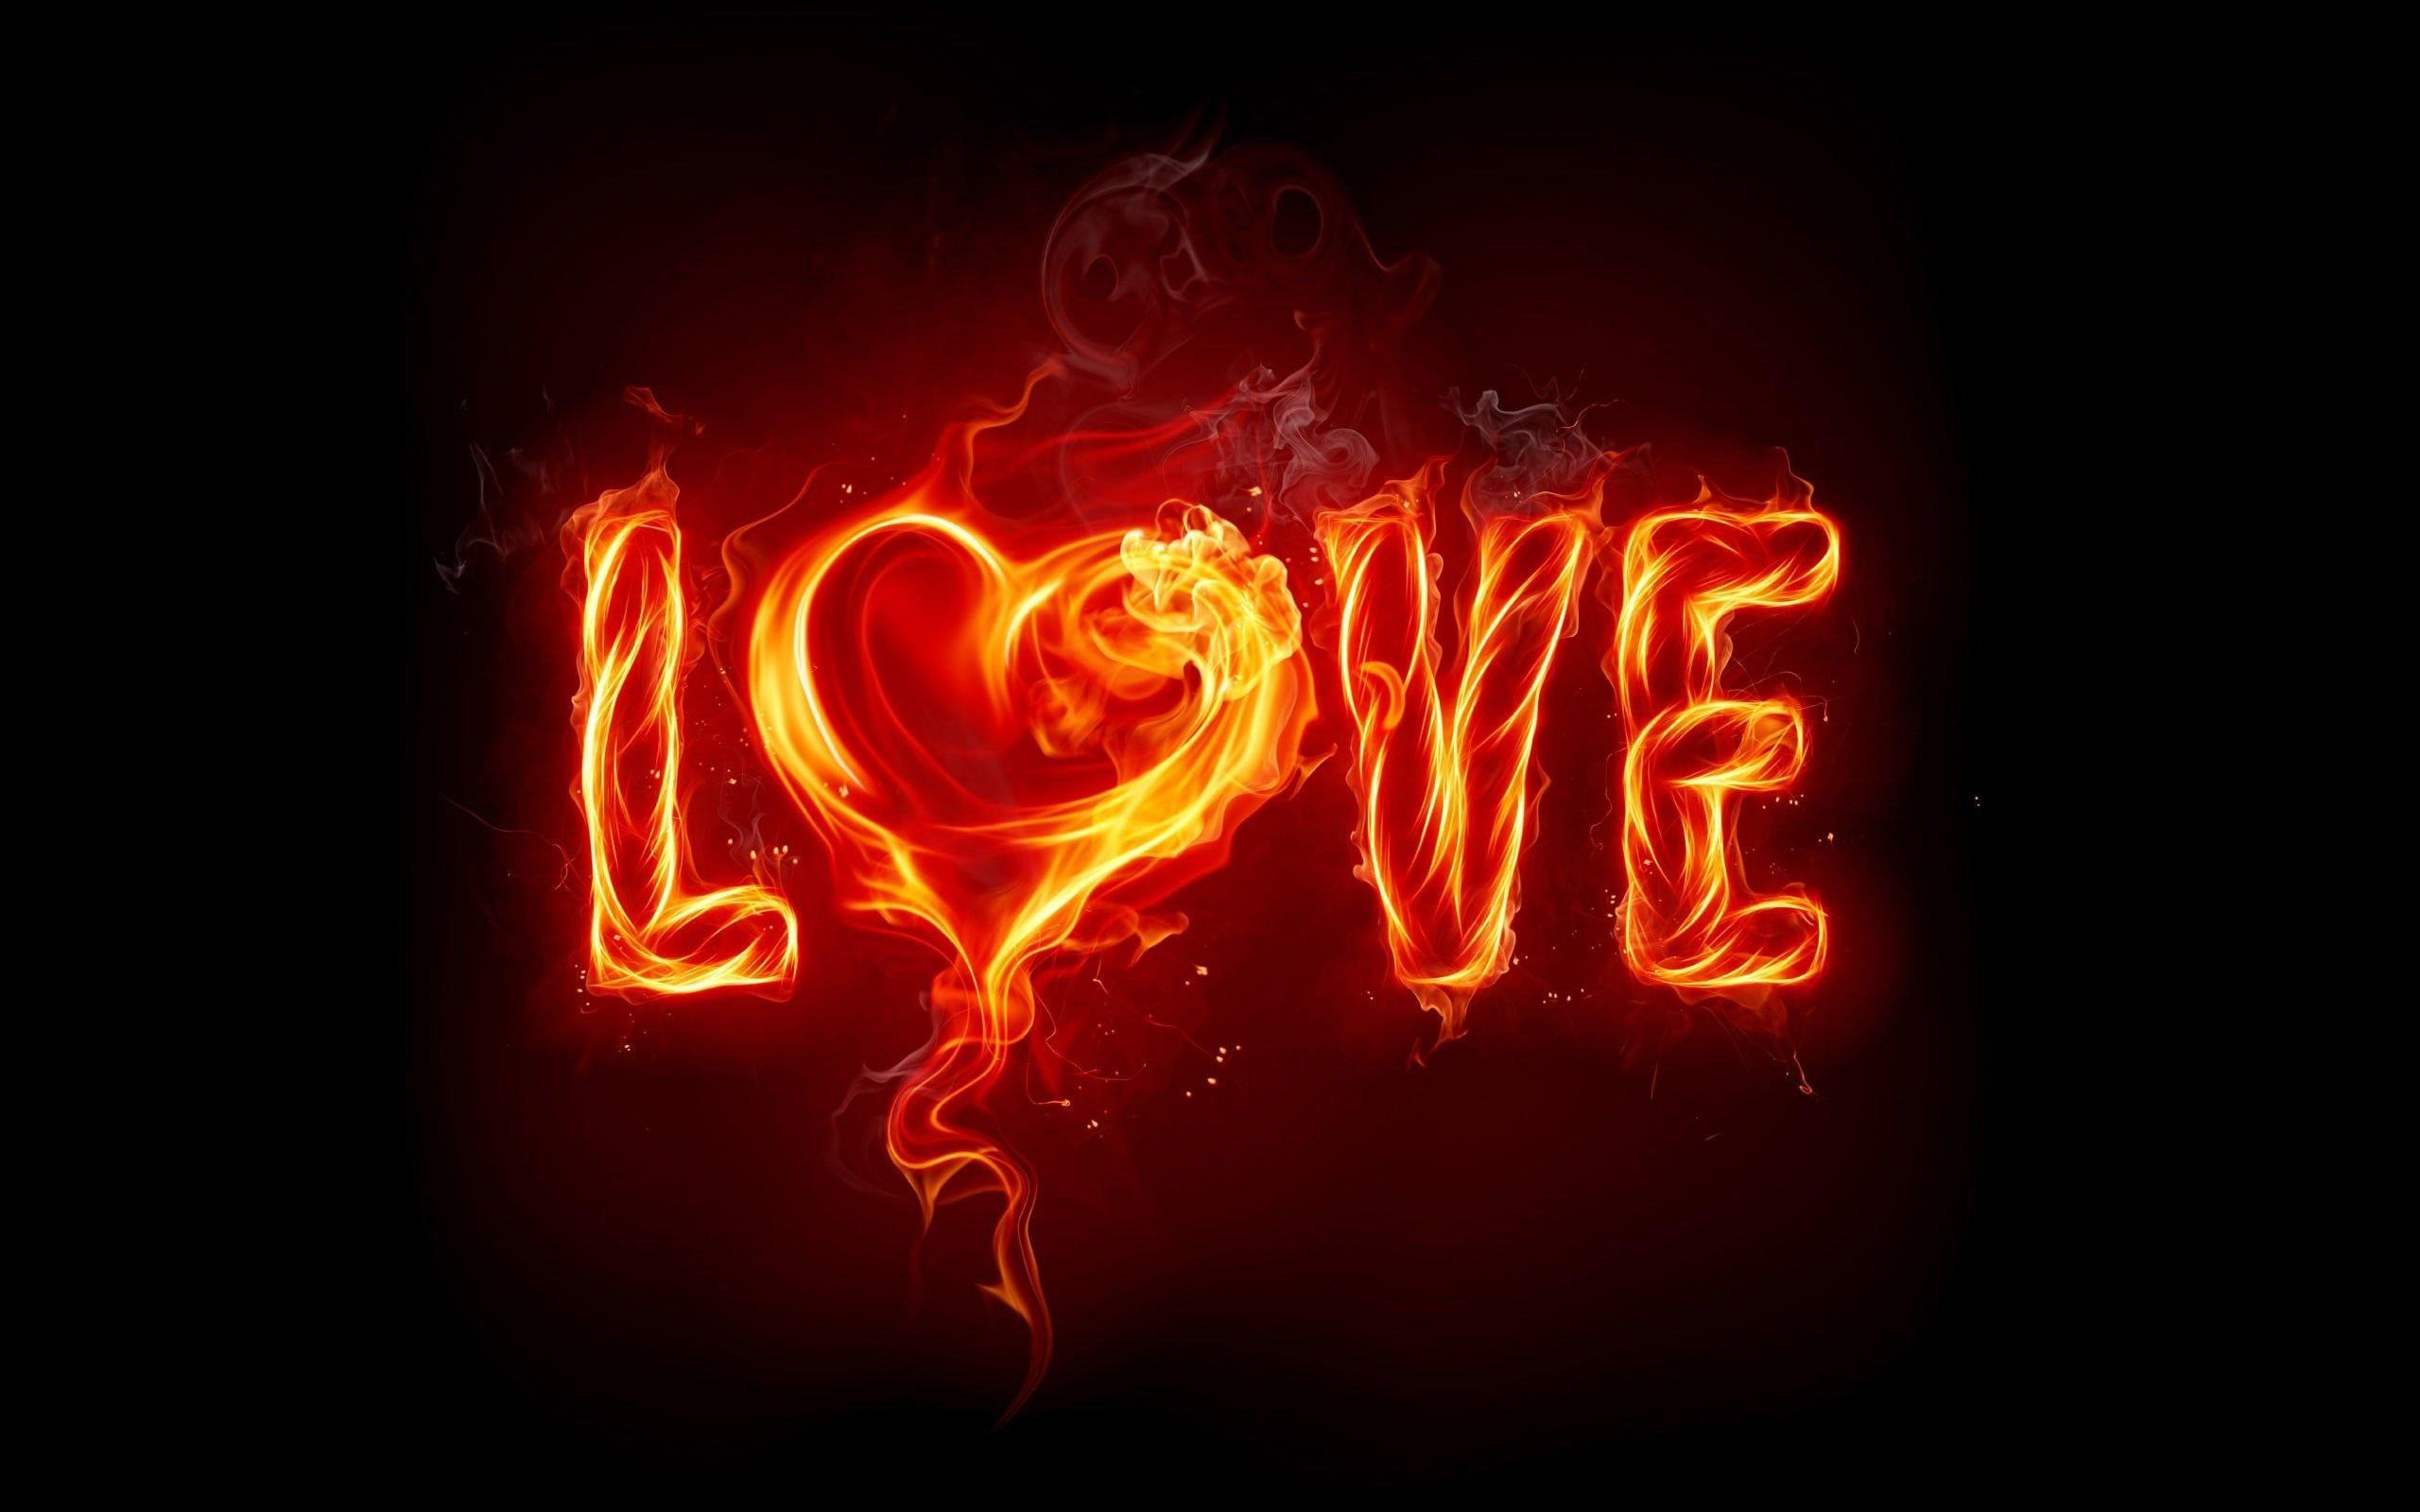 Love Wallpaper J Pictures